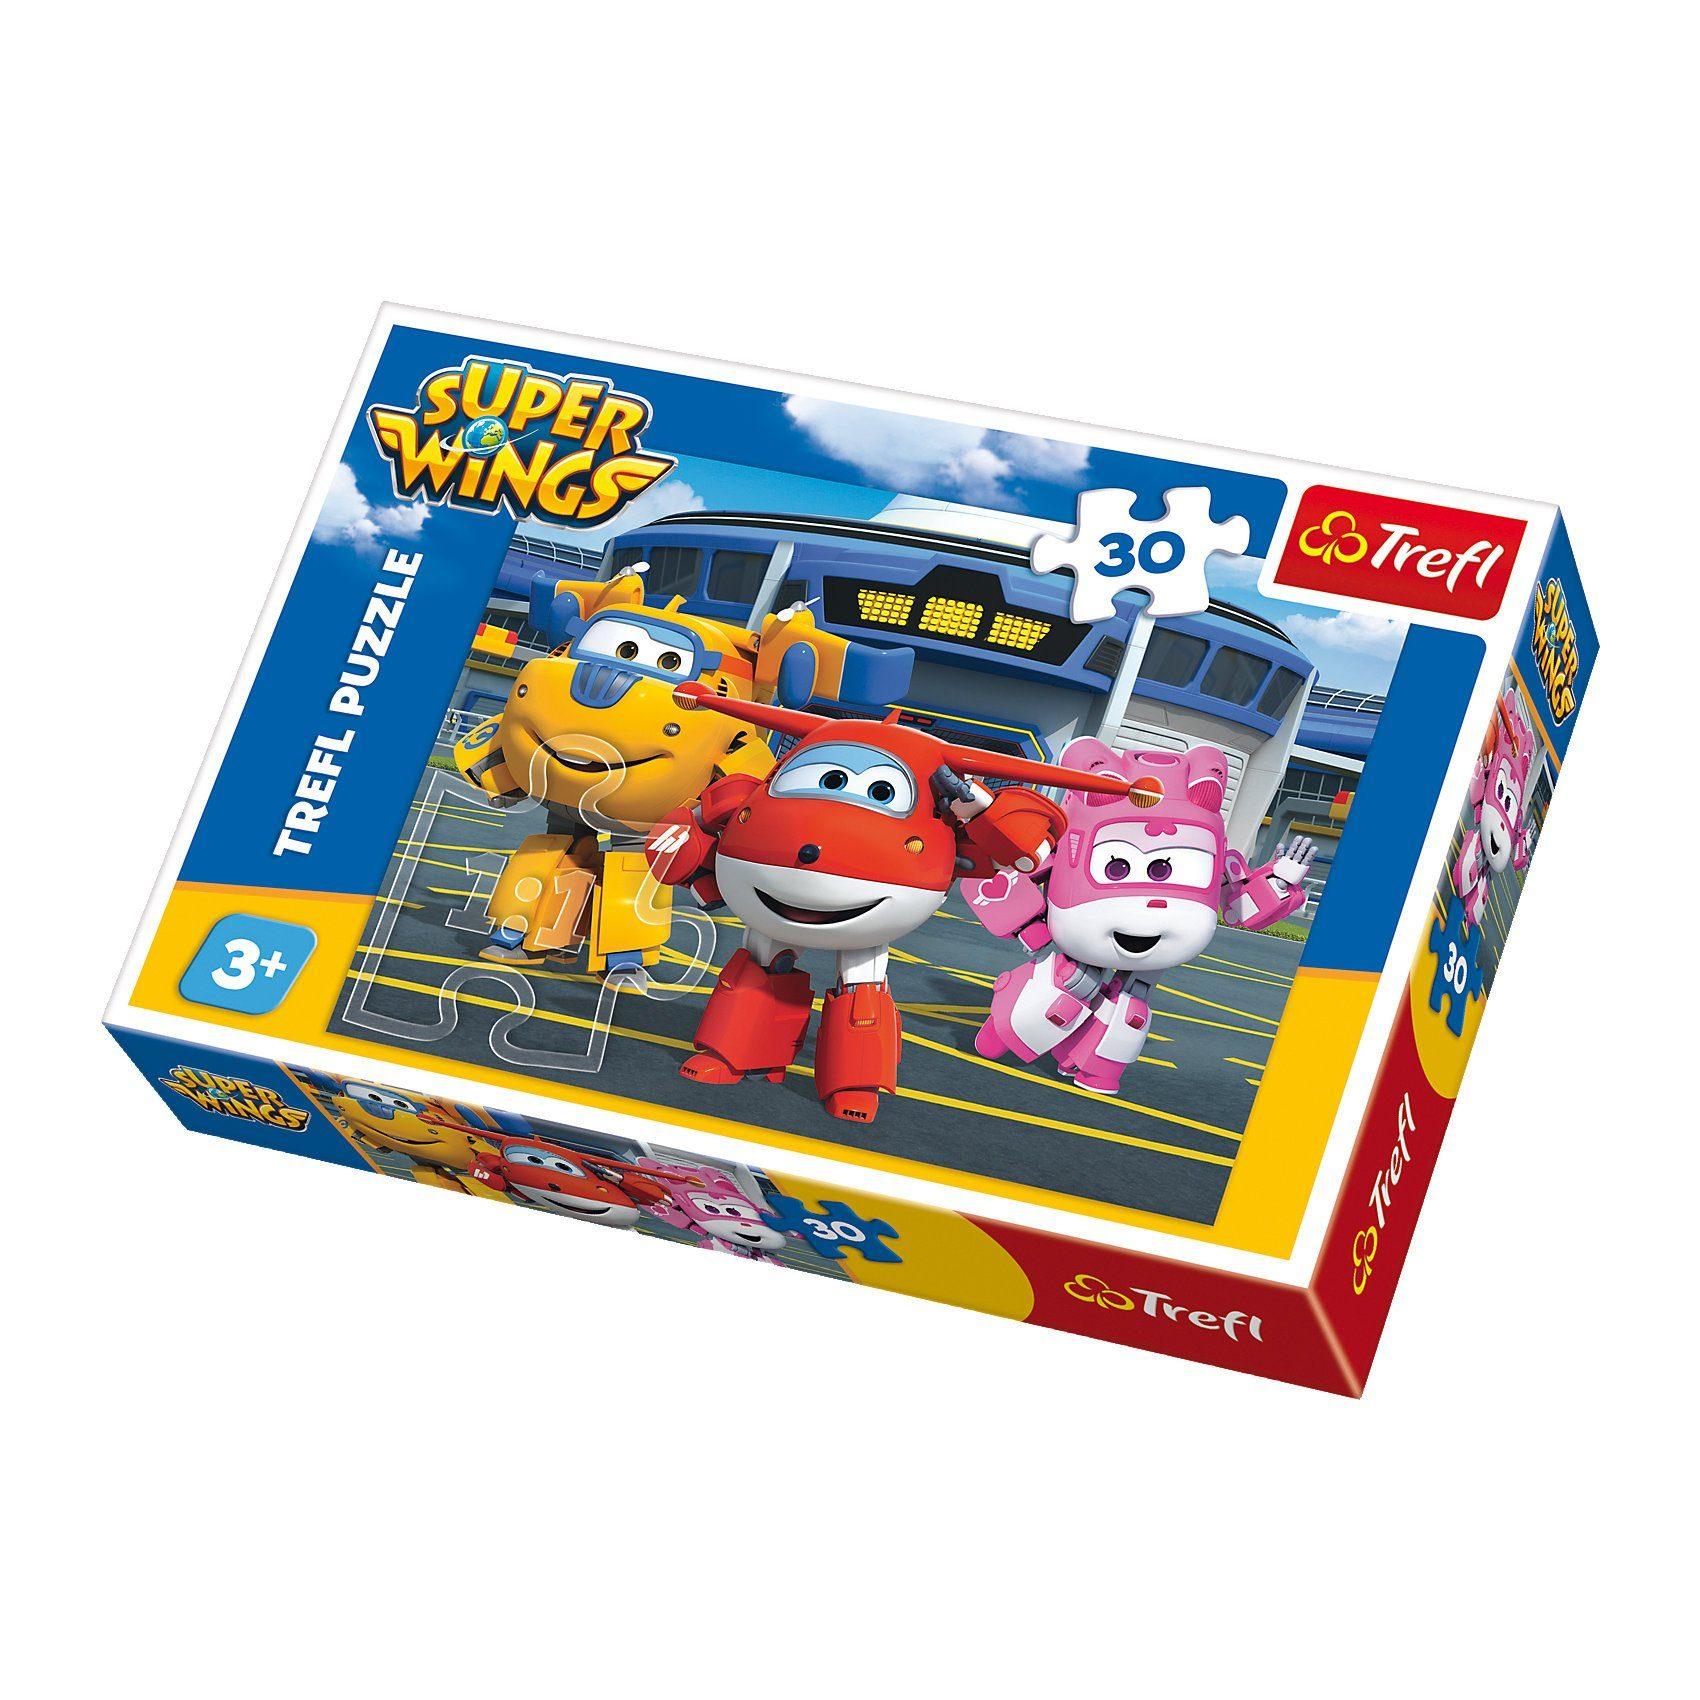 Trefl Puzzle 30 Teile - Super Wings